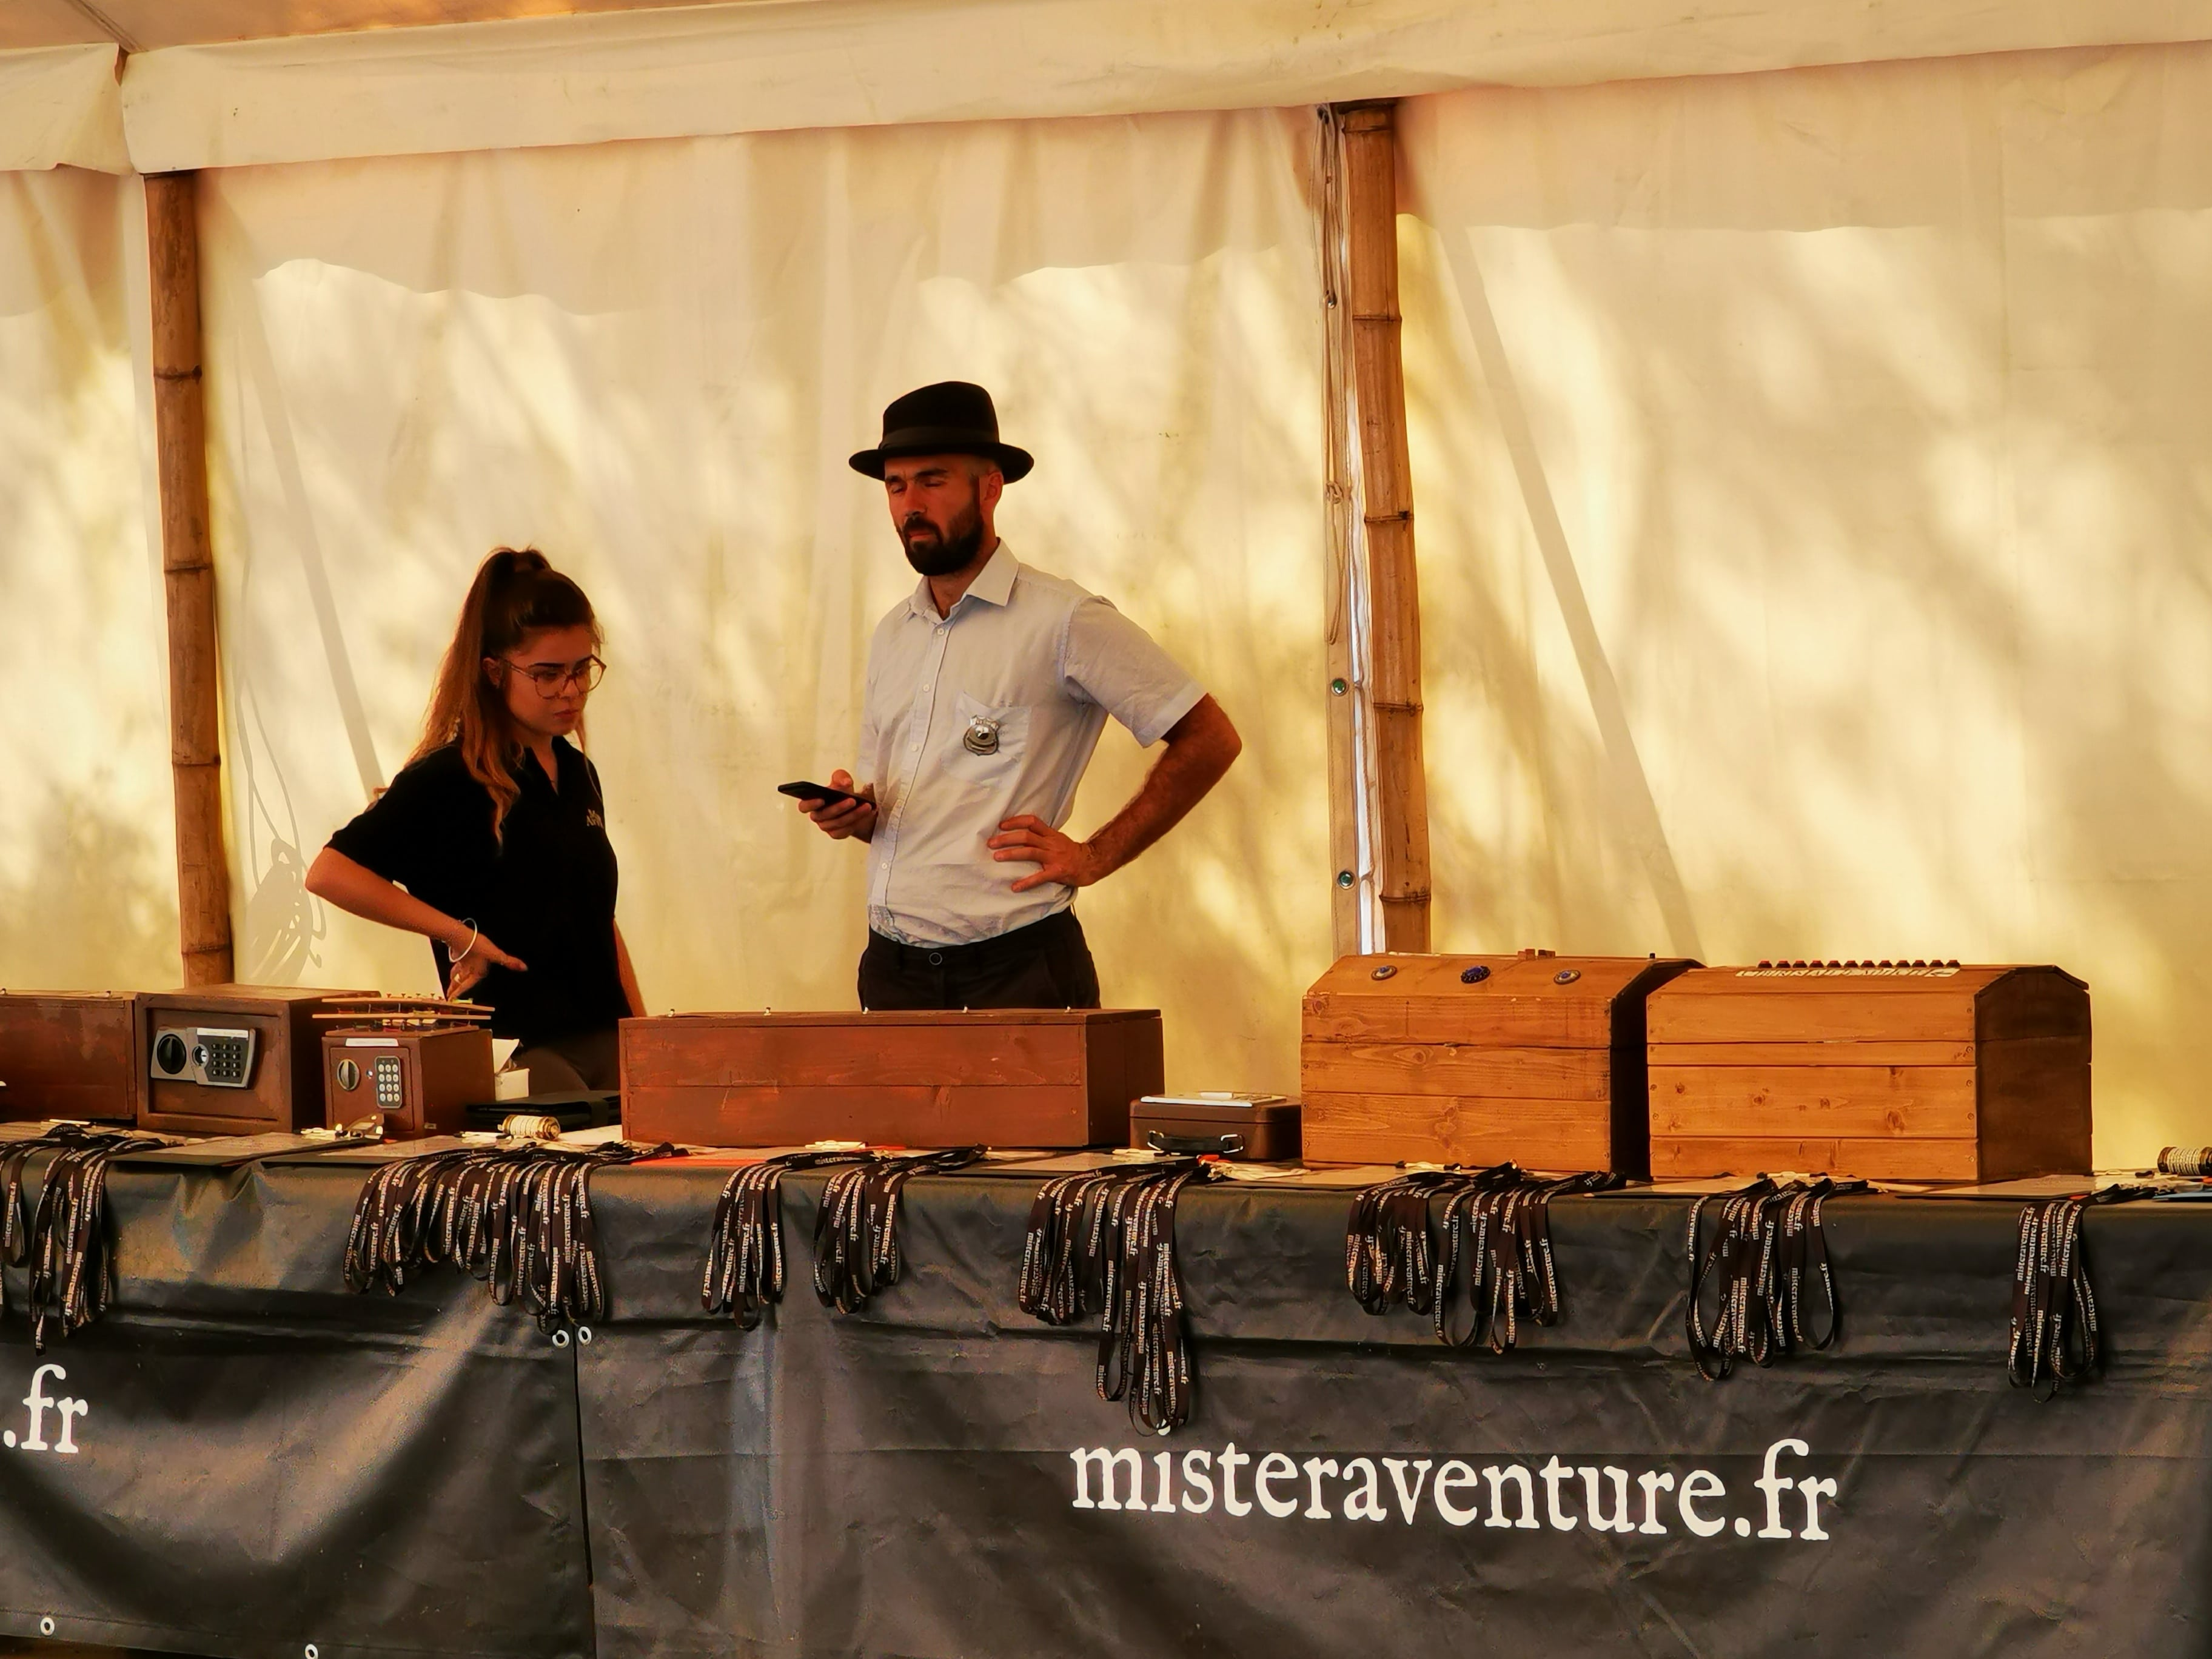 Team building - Mister Aventure